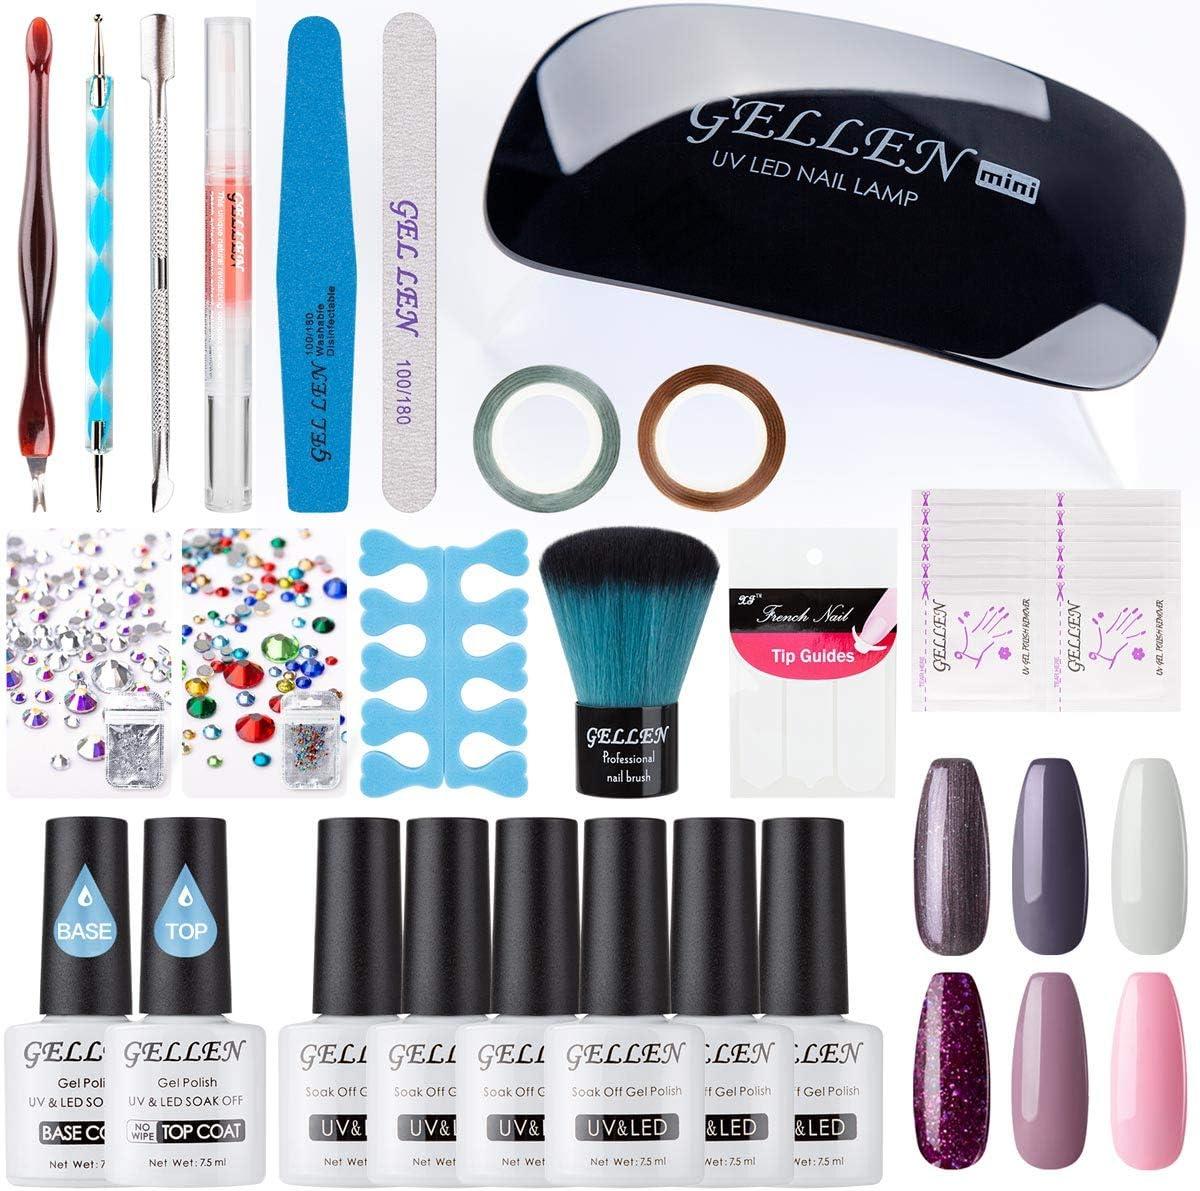 Gellen Gel Polish Starter Kit - with Top Coat Base Coat Nail Dryer Light 6 Colors Nail Art Design Tools, Portable DIY Home Gel Manicure, PurplePink Brown